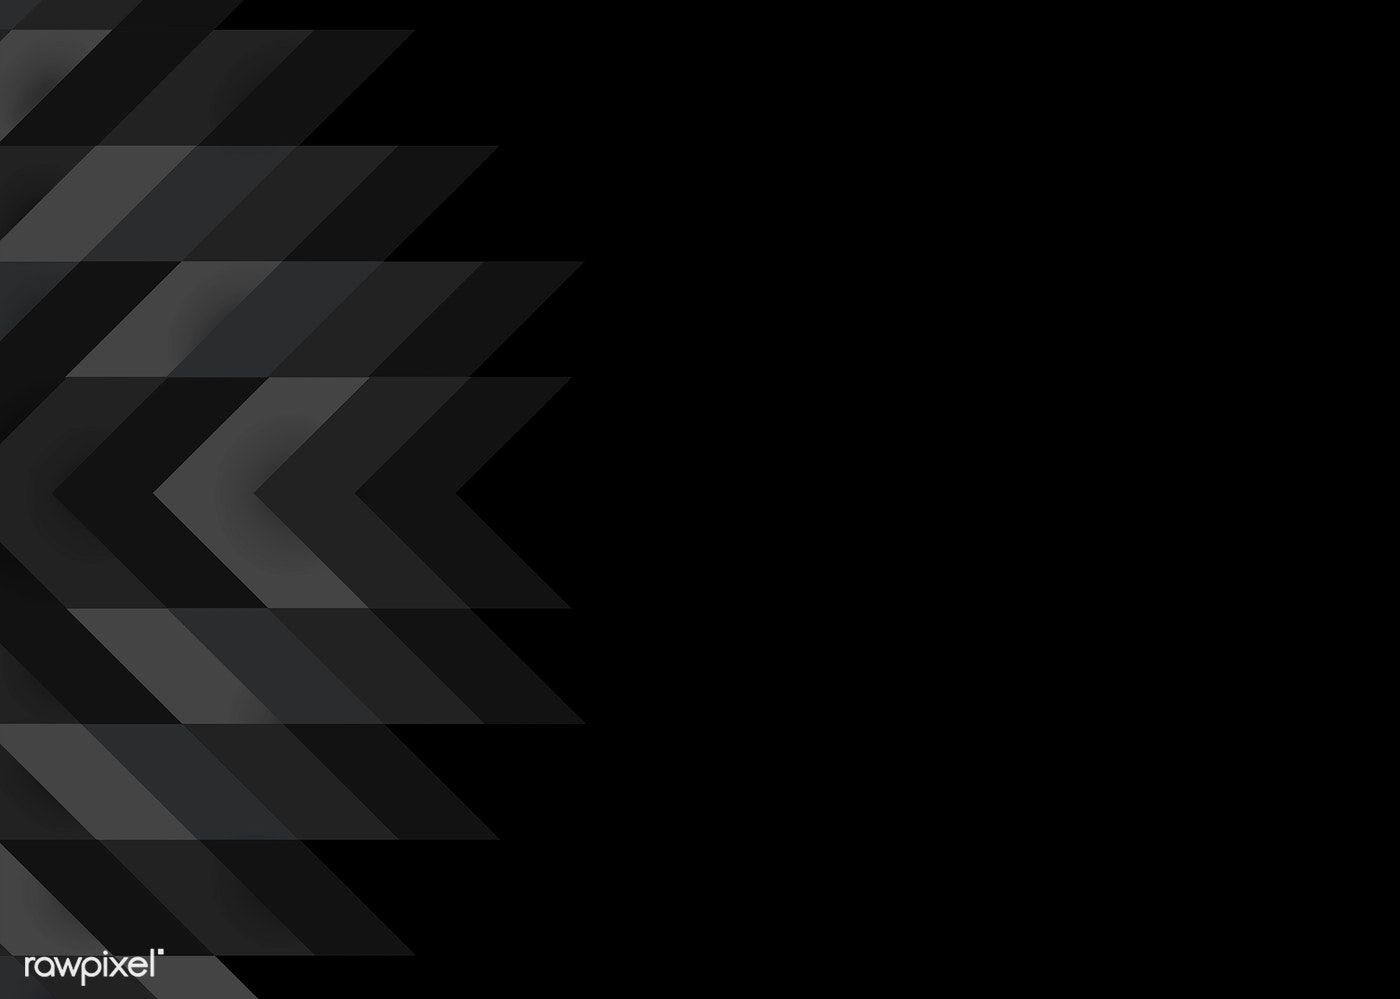 Black Modern Background Design Vector Free Image By Rawpixel Com Lukisan Abstrak Abstrak Lukisan